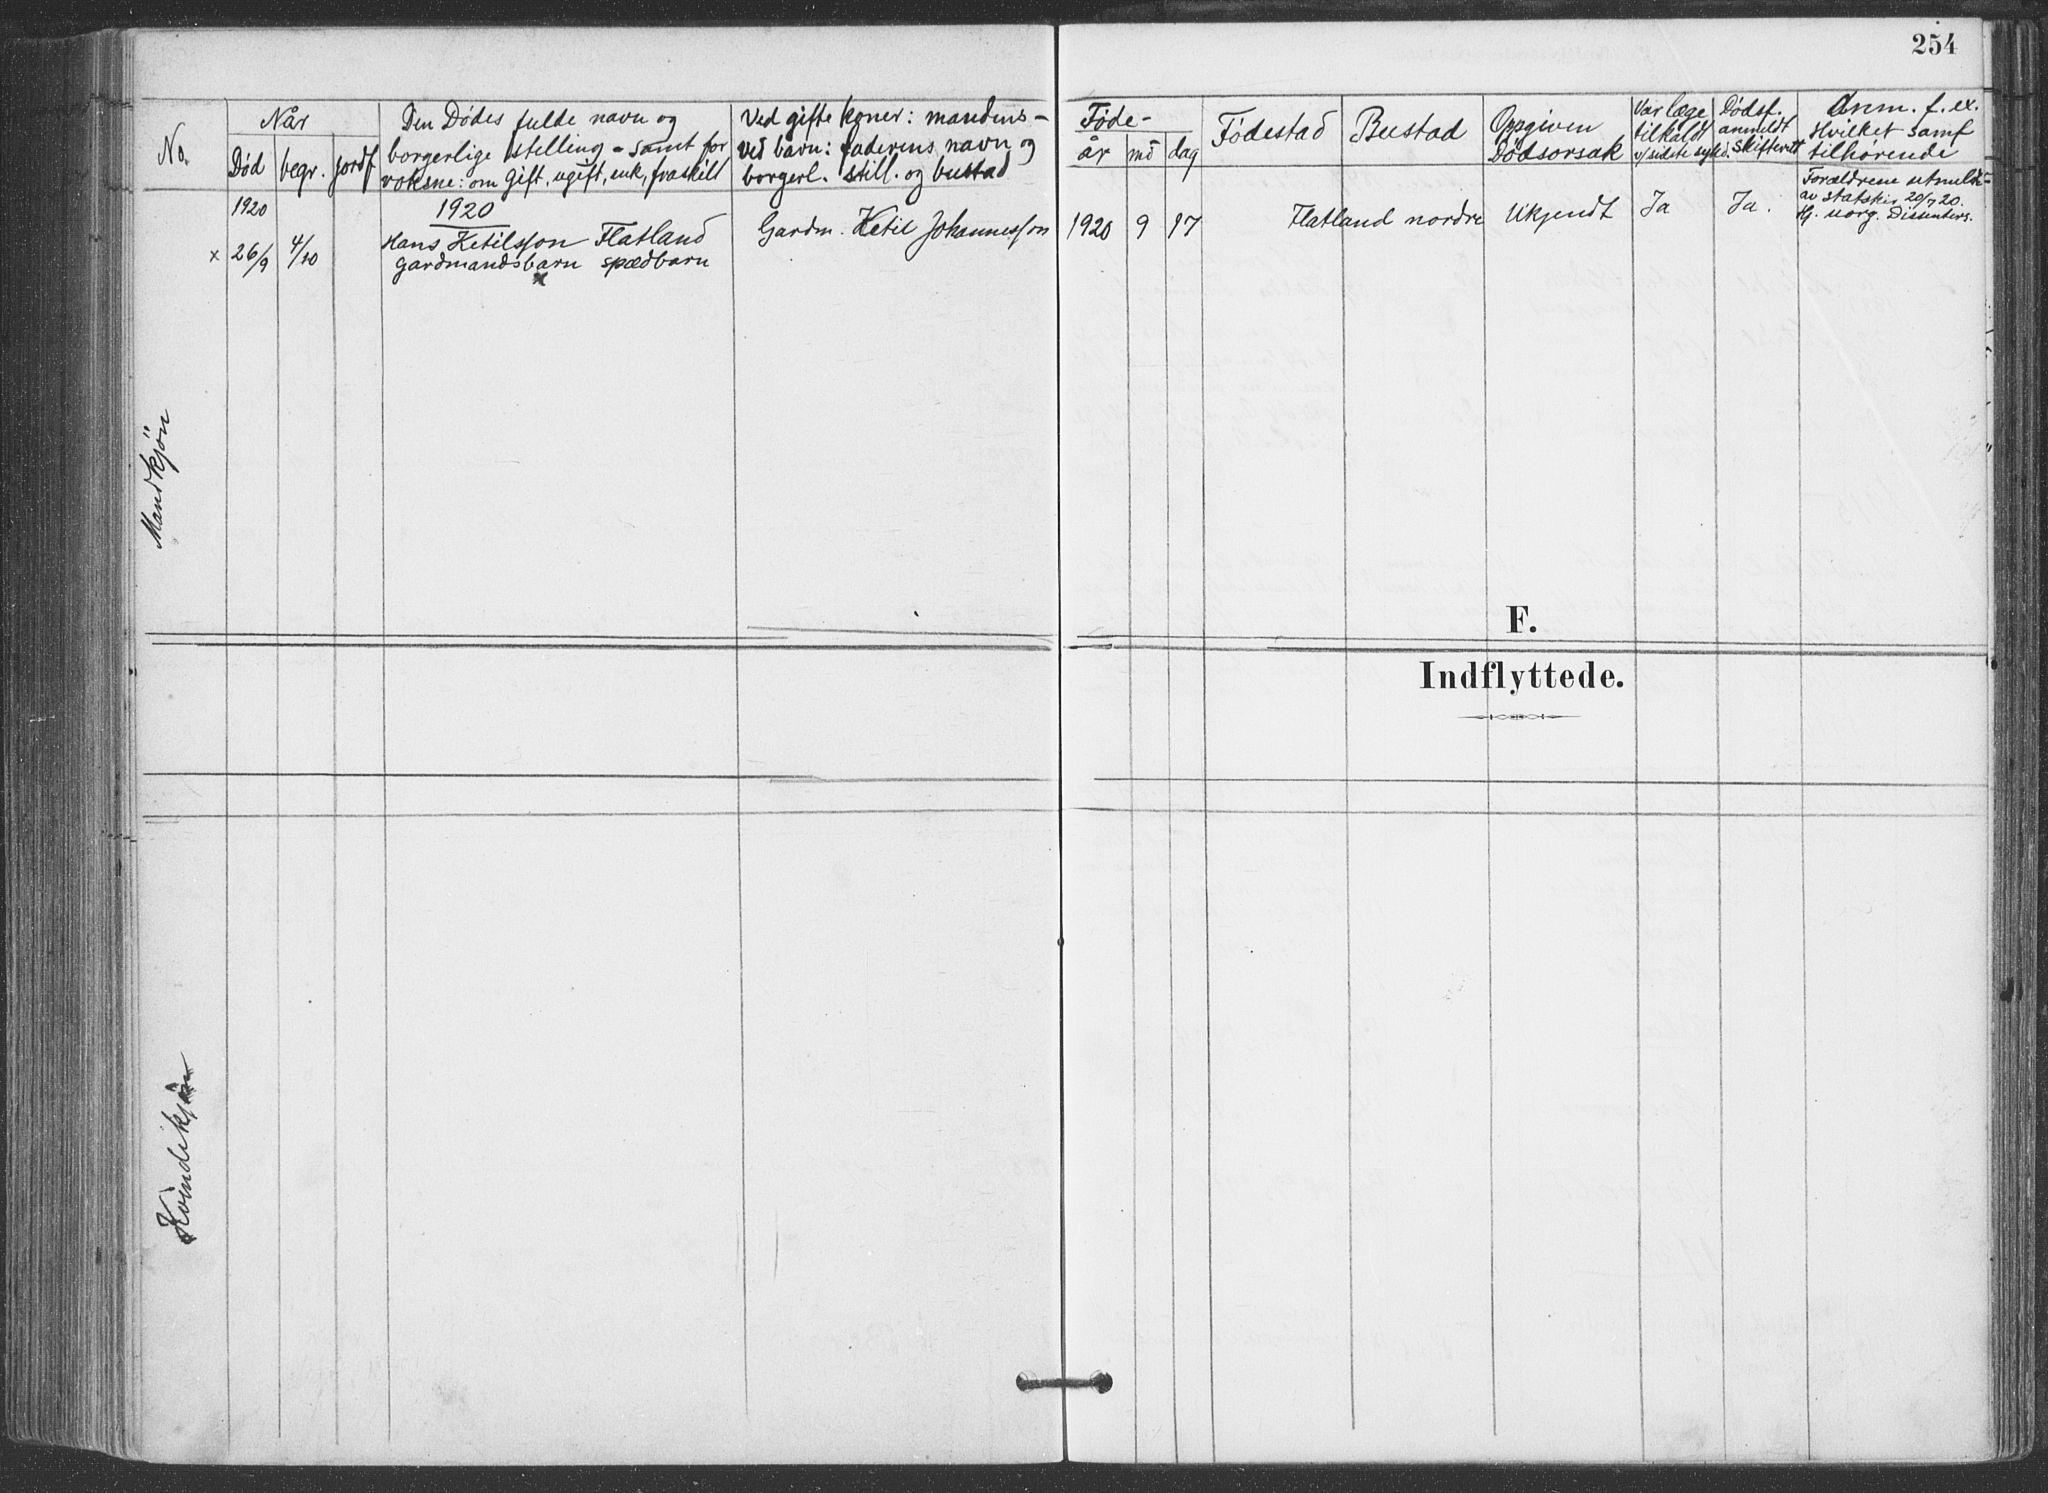 SAKO, Hjartdal kirkebøker, F/Fa/L0010: Ministerialbok nr. I 10, 1880-1929, s. 254